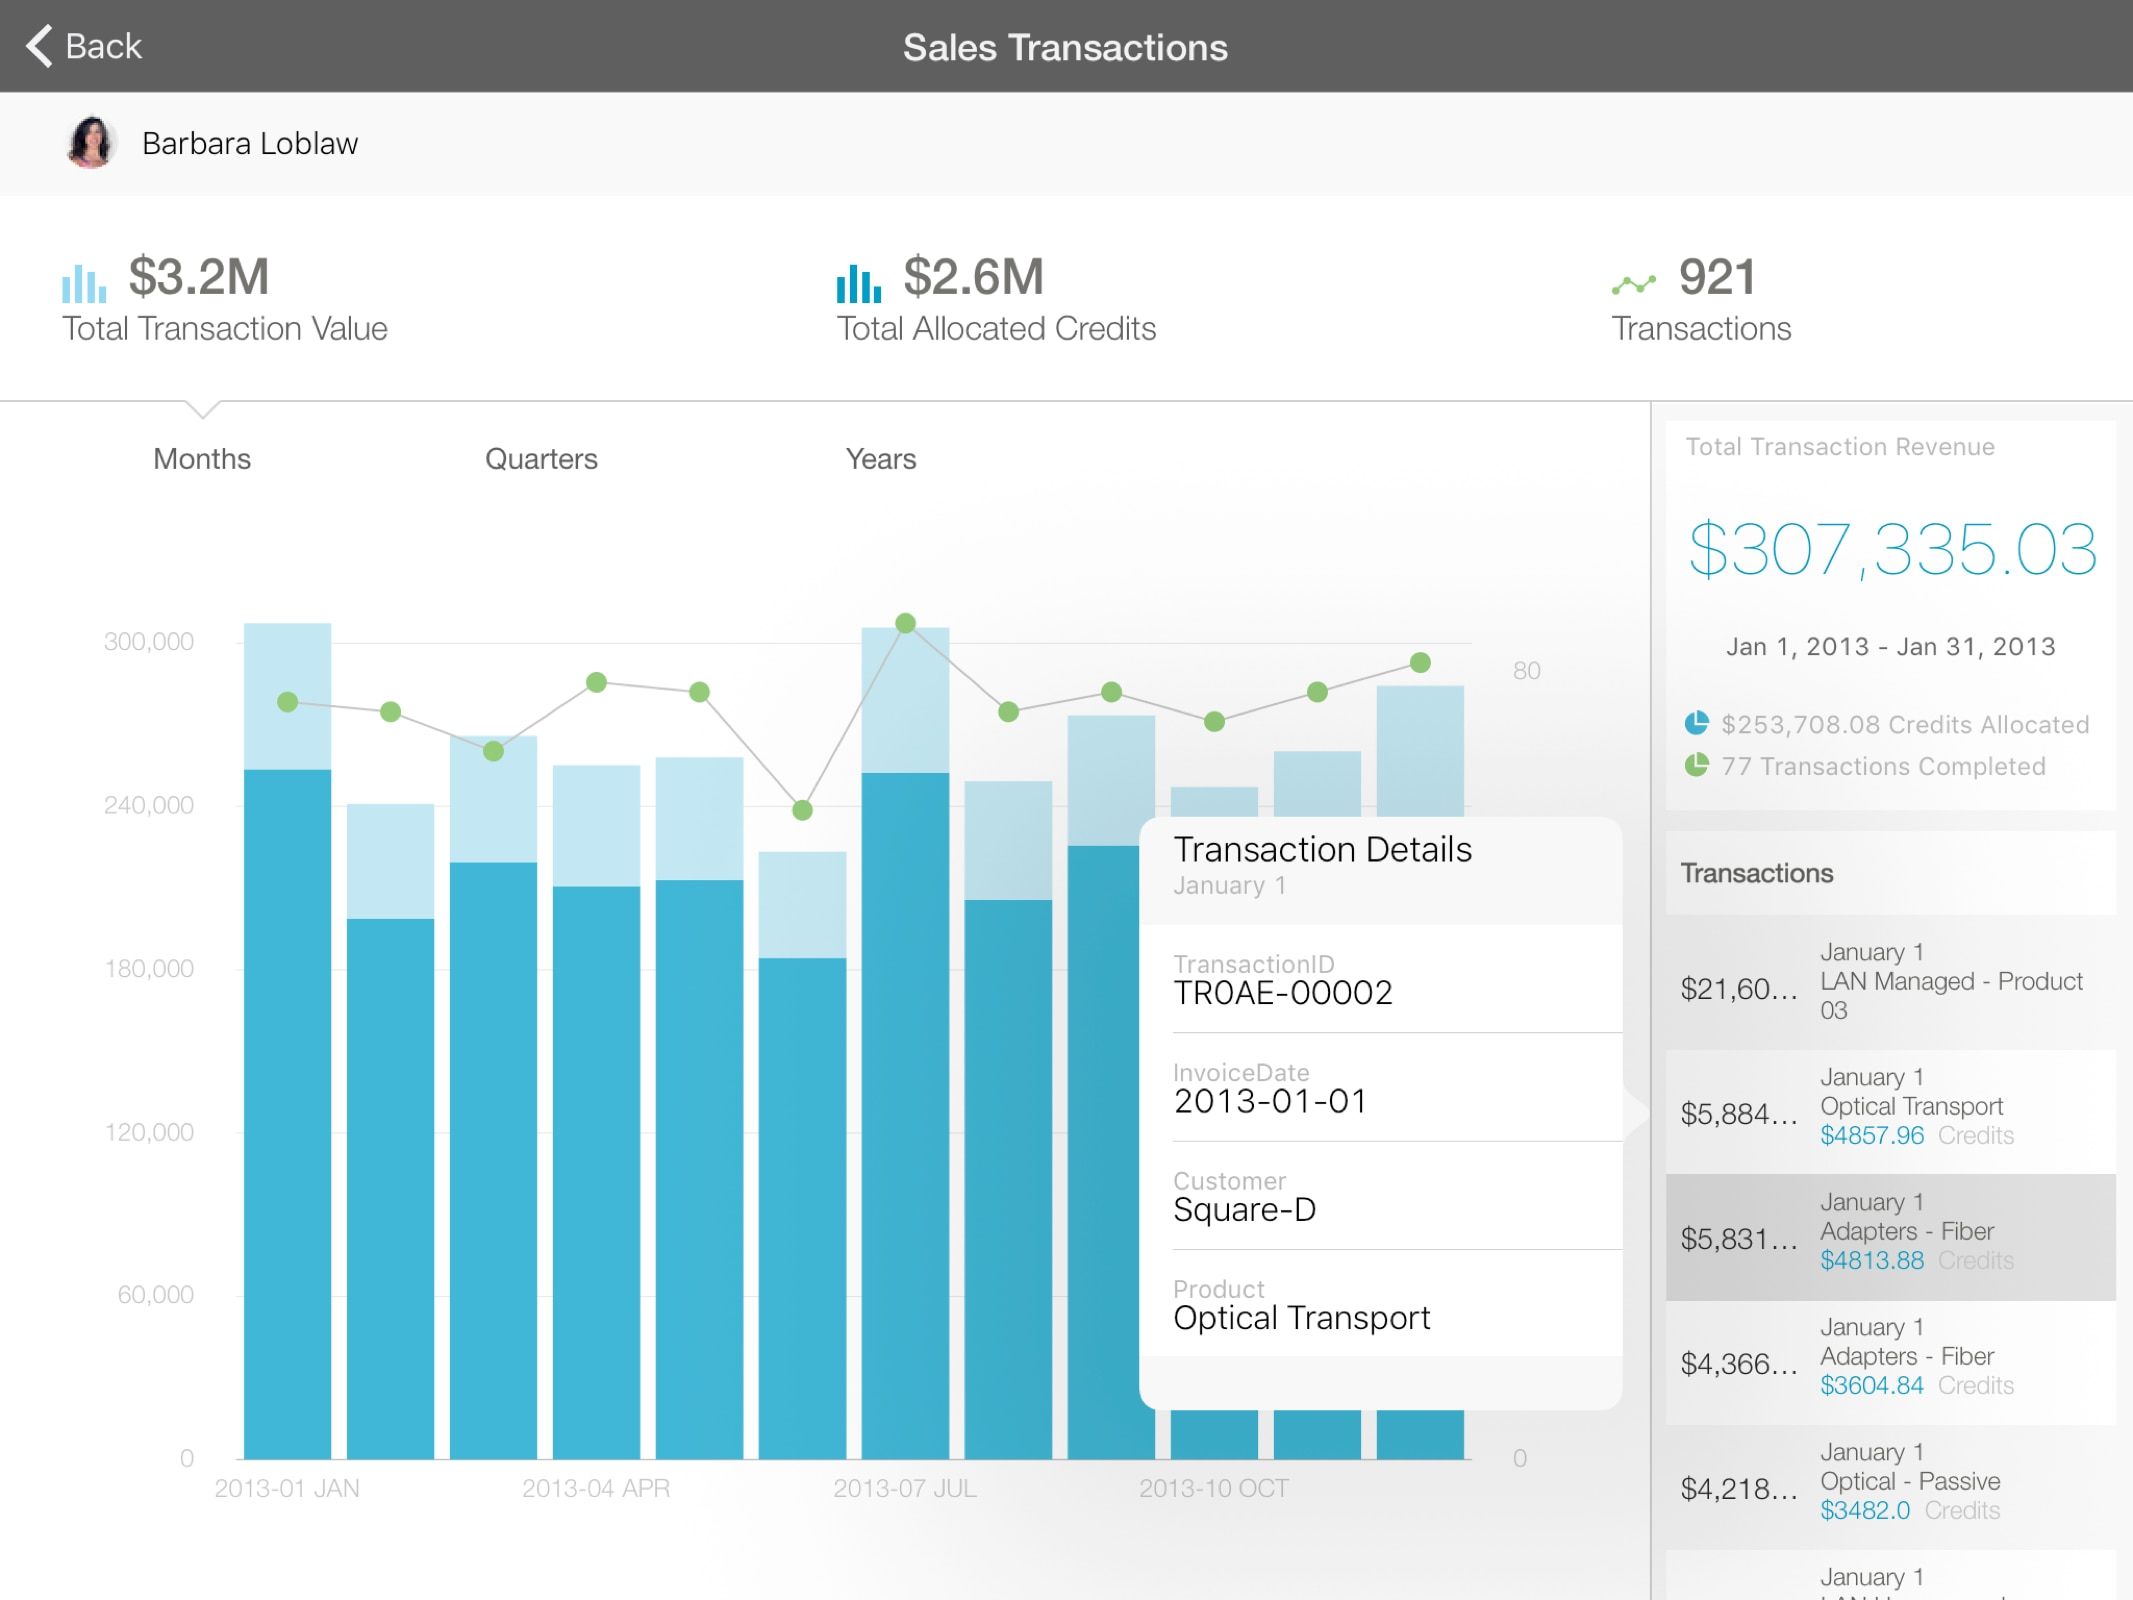 IBM Incentive Compensation Management